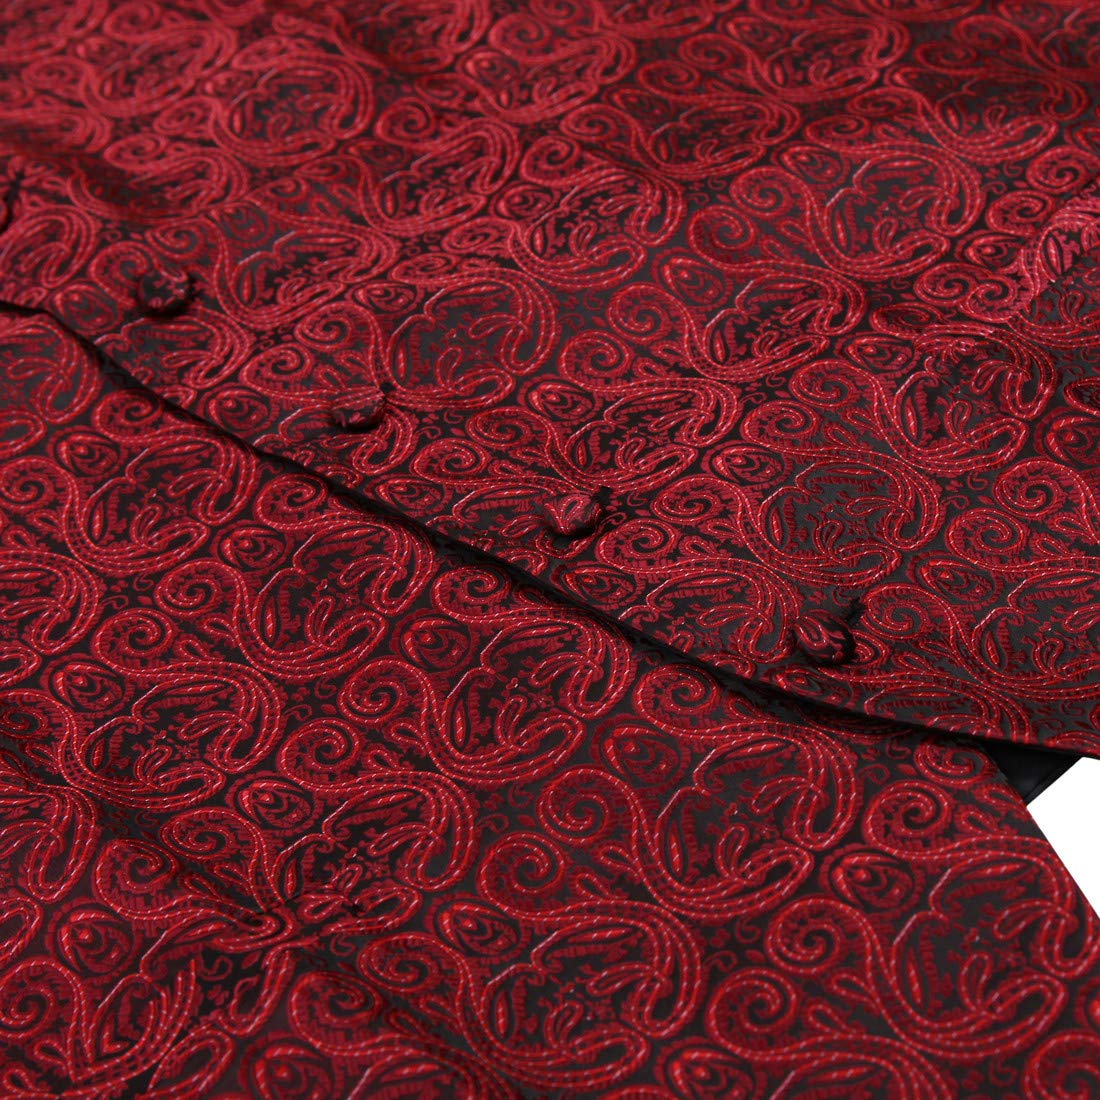 Epoint EGD1B06B-M Blue Black Paisley Microfiber Dress Tuxedo Vest Neck Tie Set Elegant For Birthday